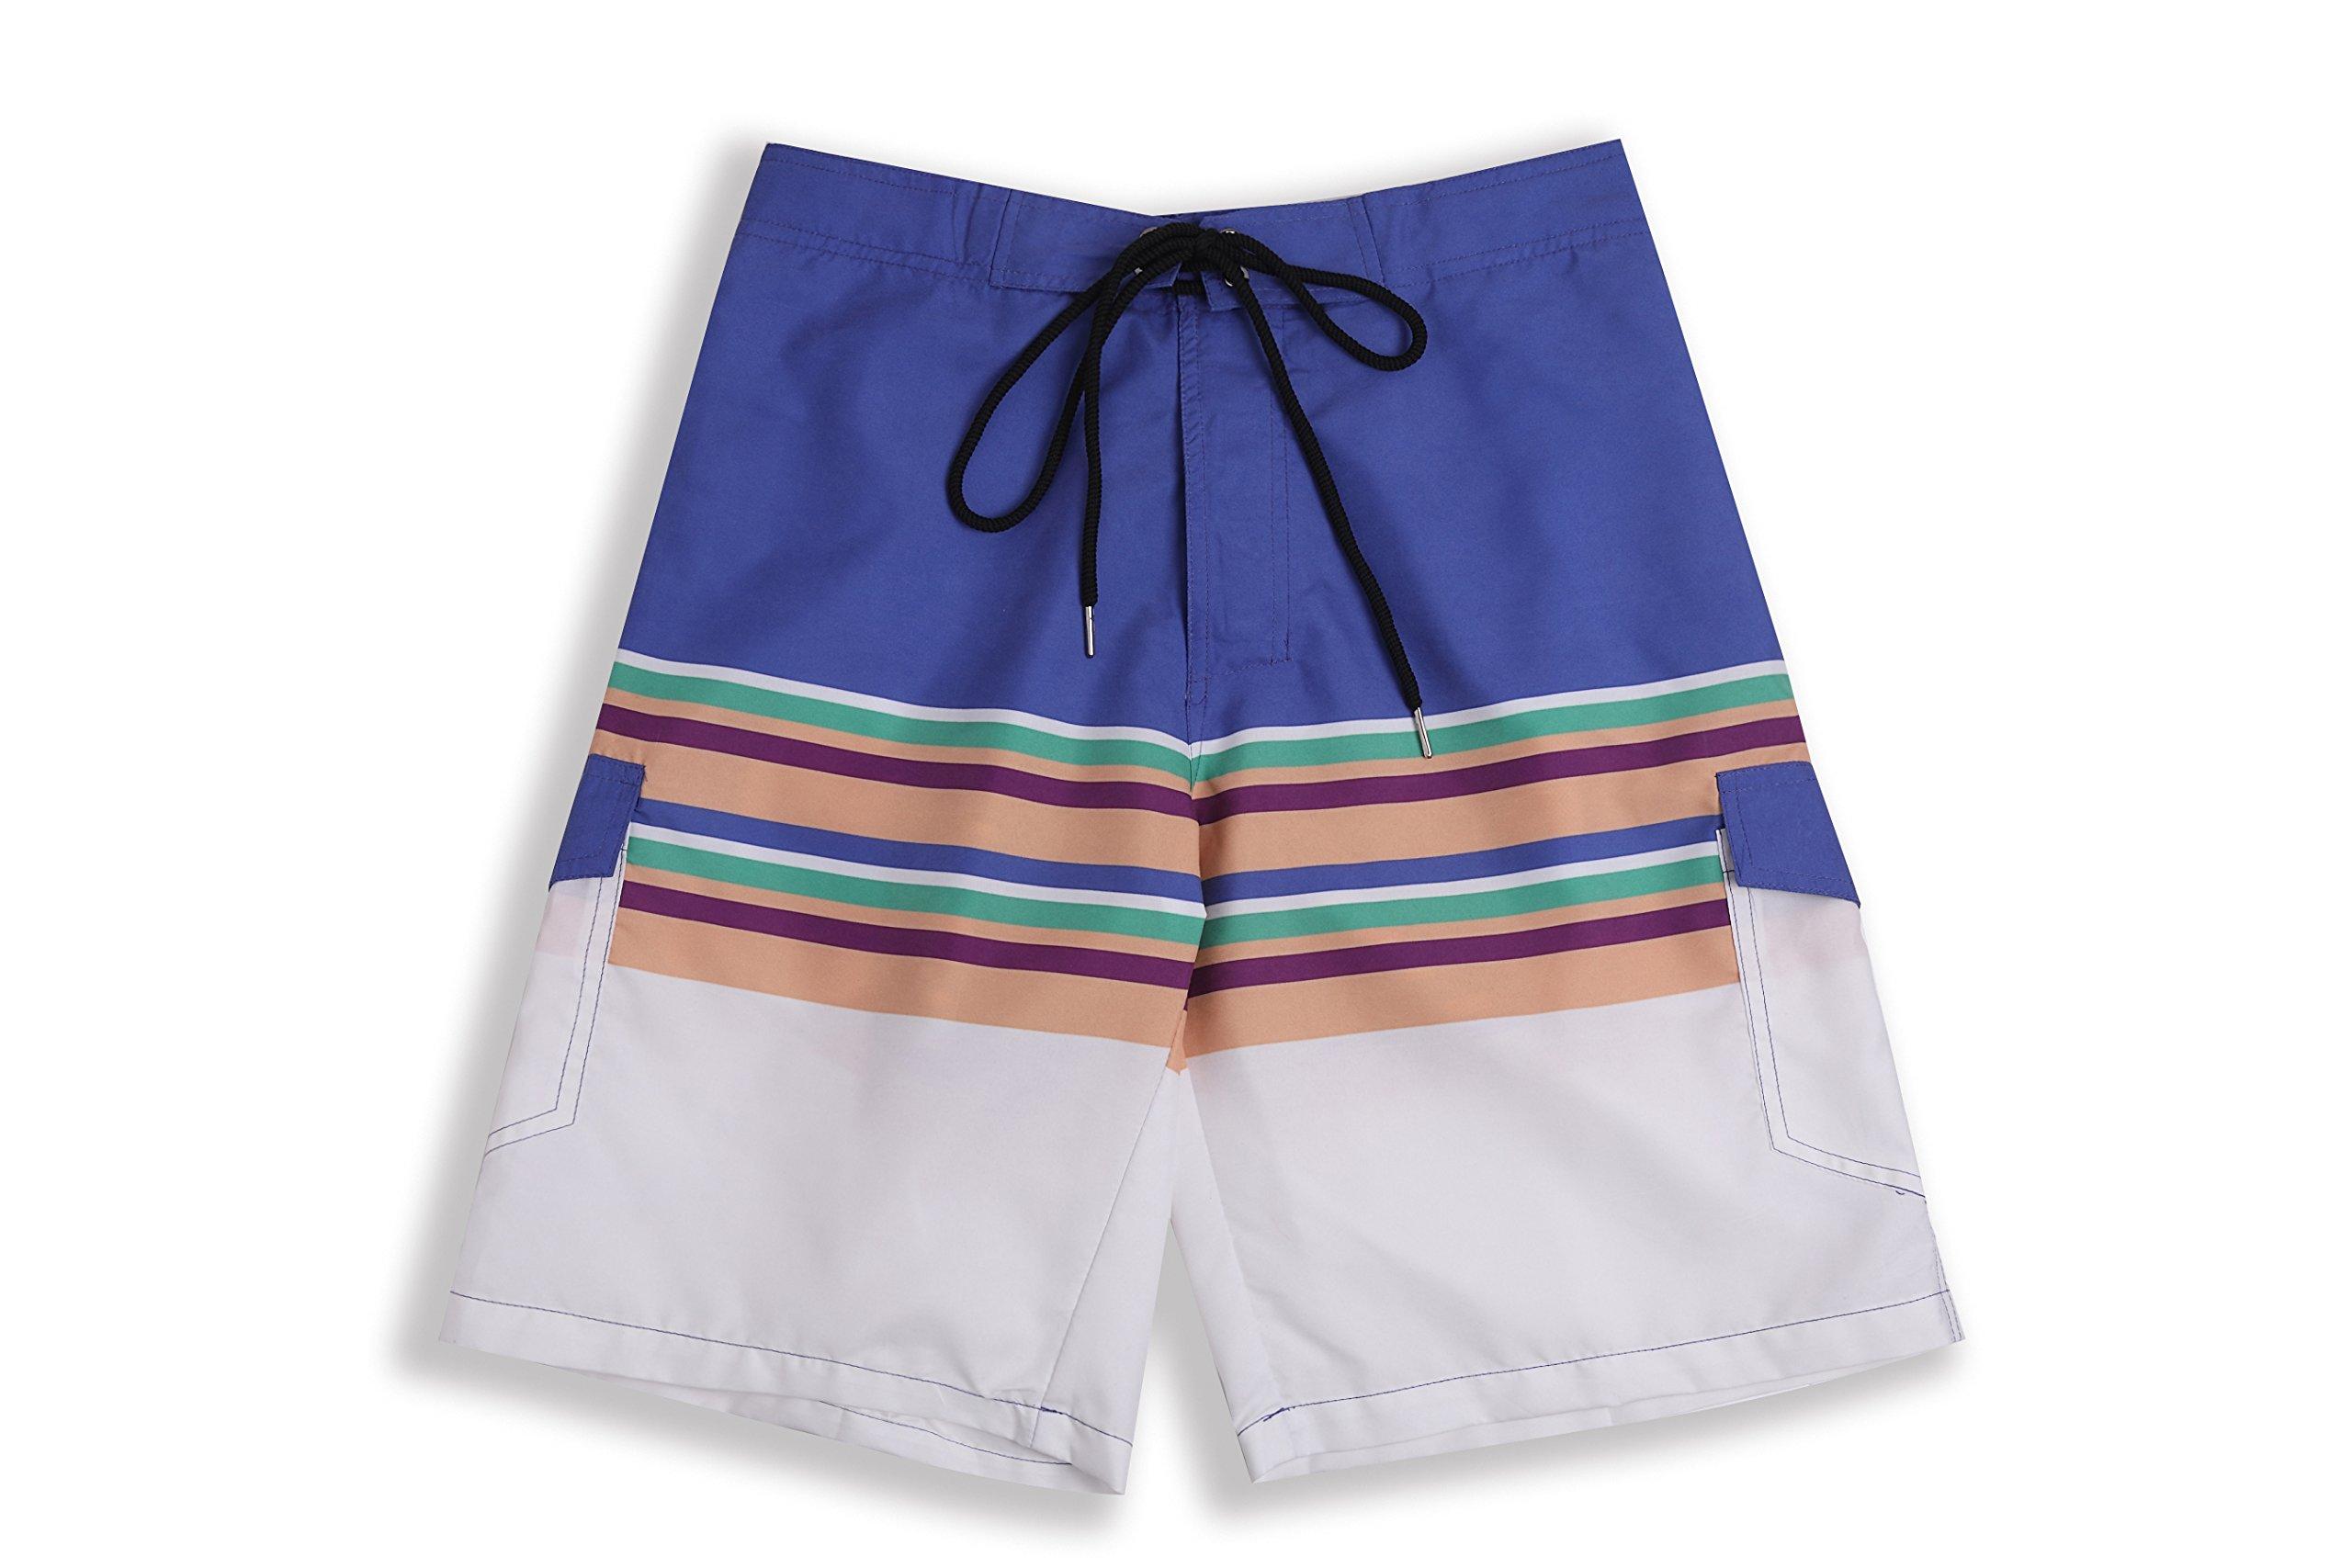 Hopioneer Men's Striped Beach Shorts - Quick Dry Swimwear Board Shorts with Pockets